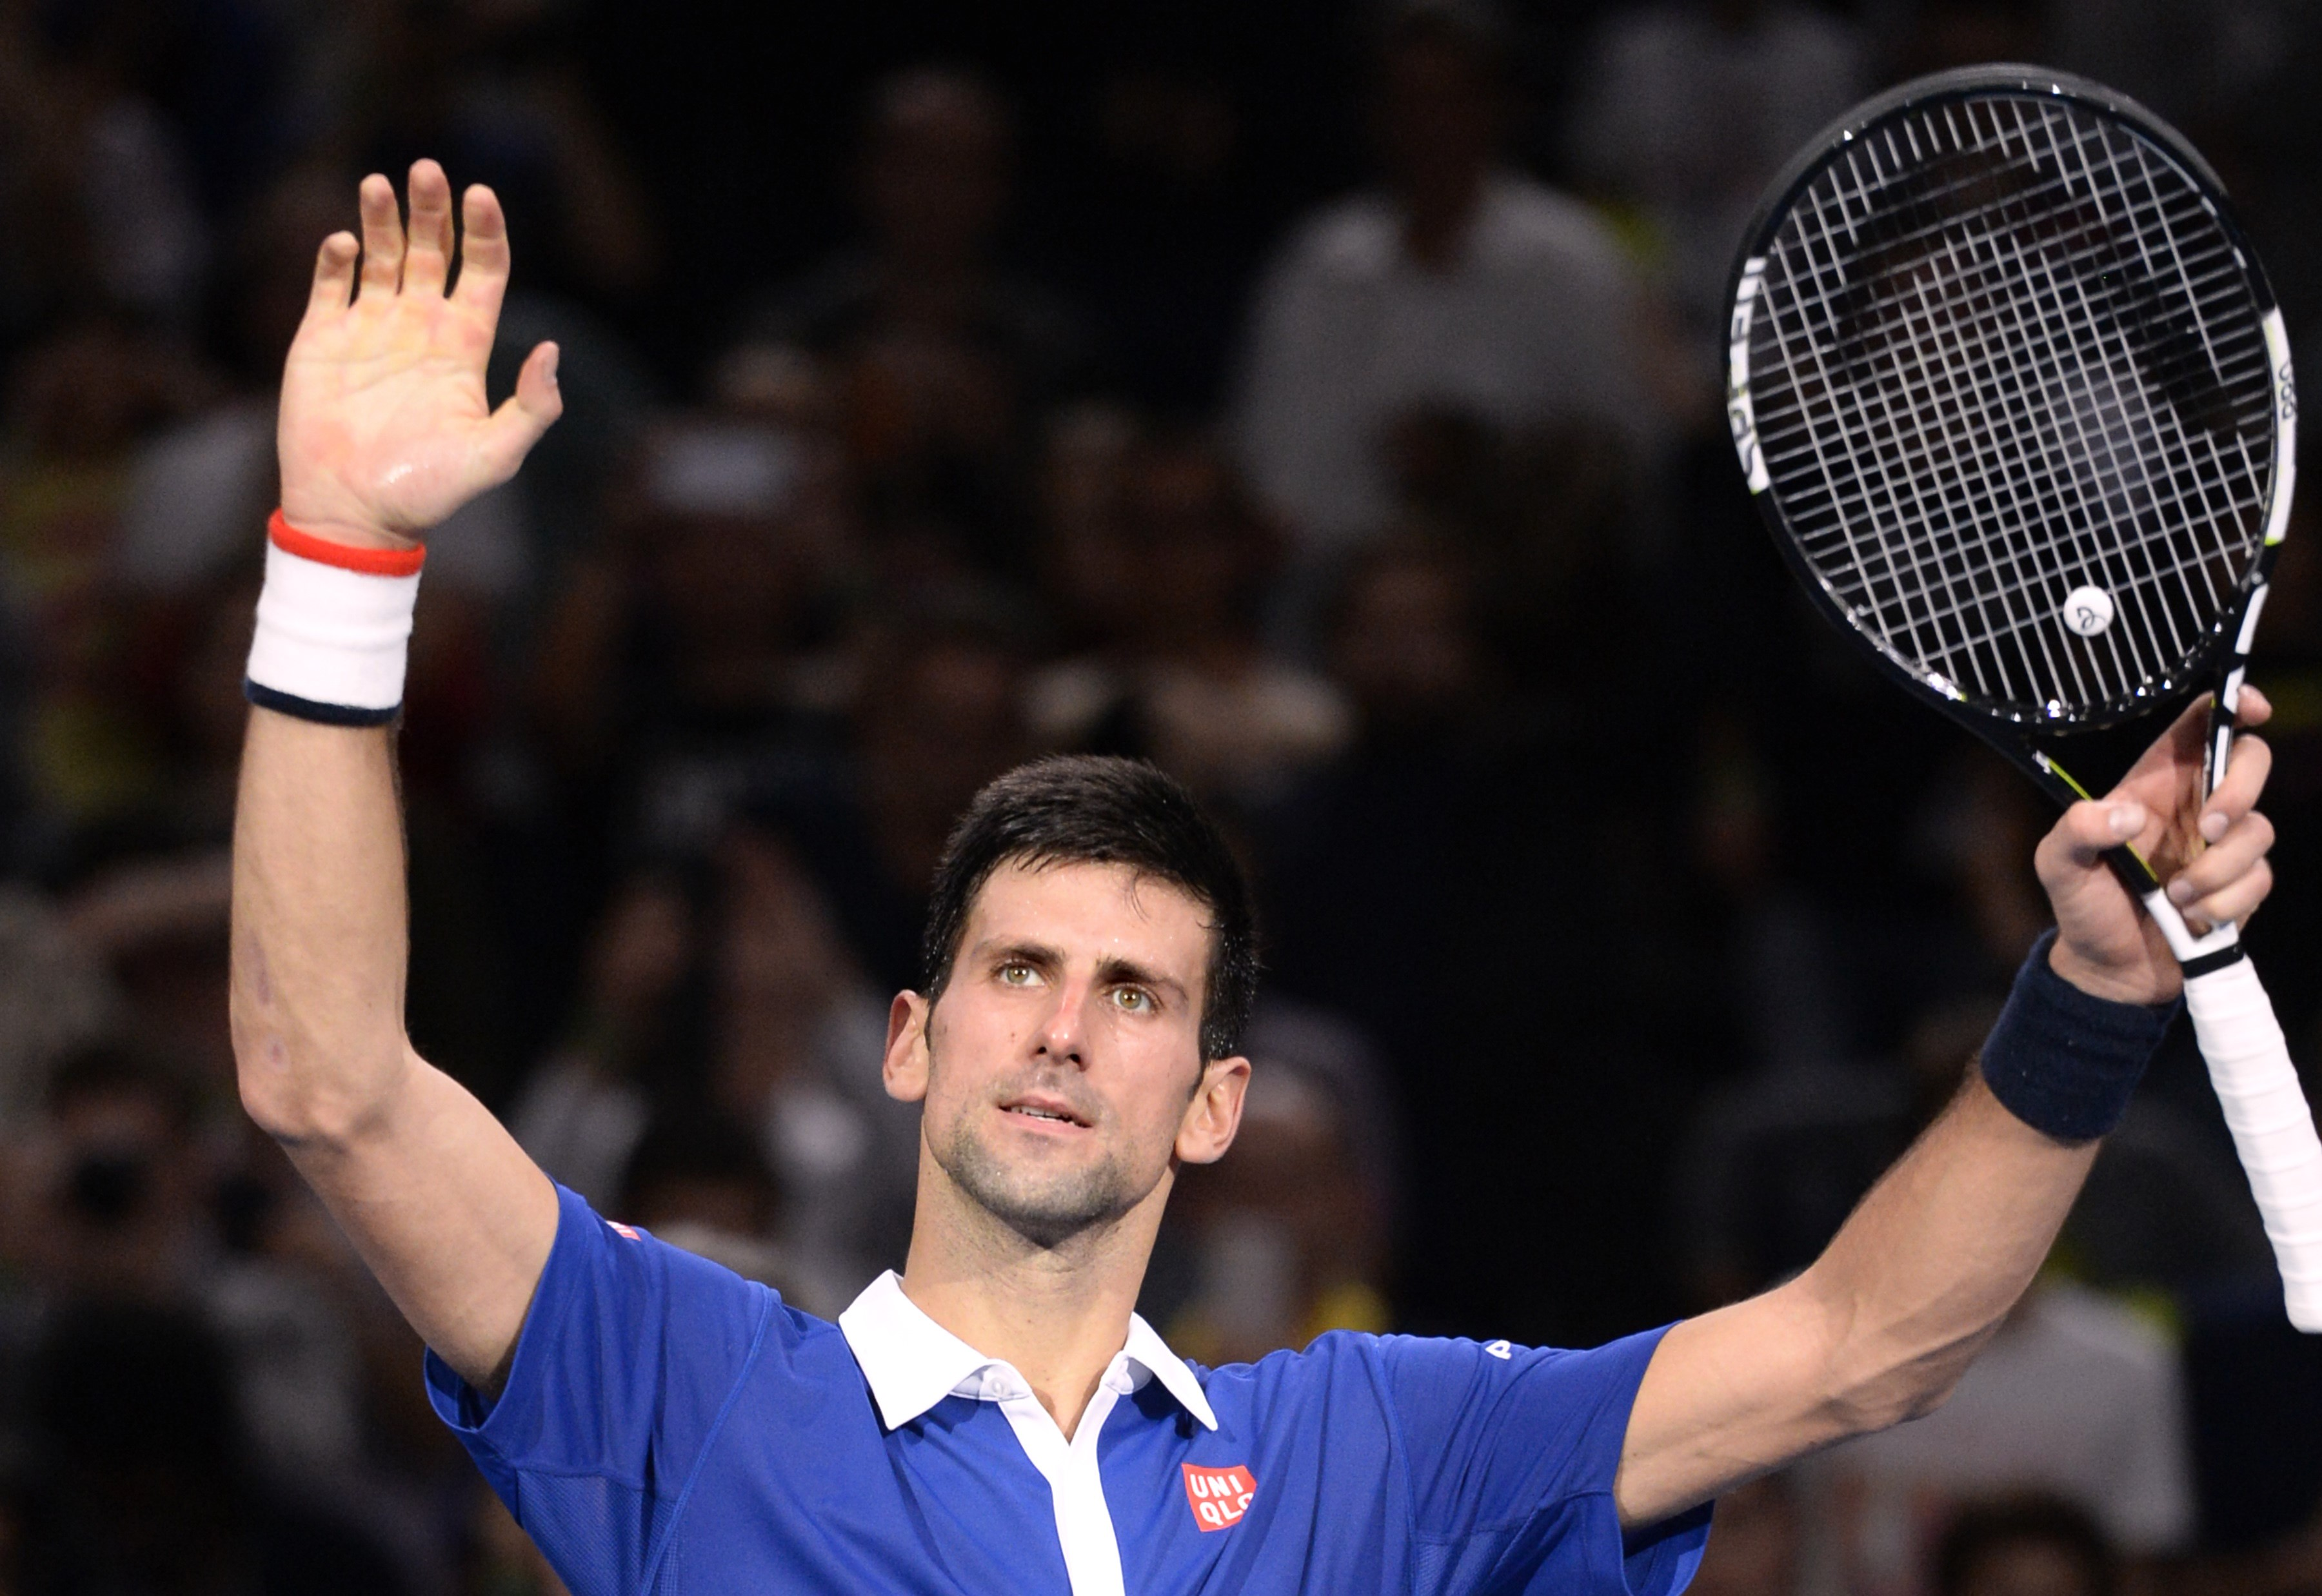 Novak Djokovic au Masters 1000 de Paris 2015